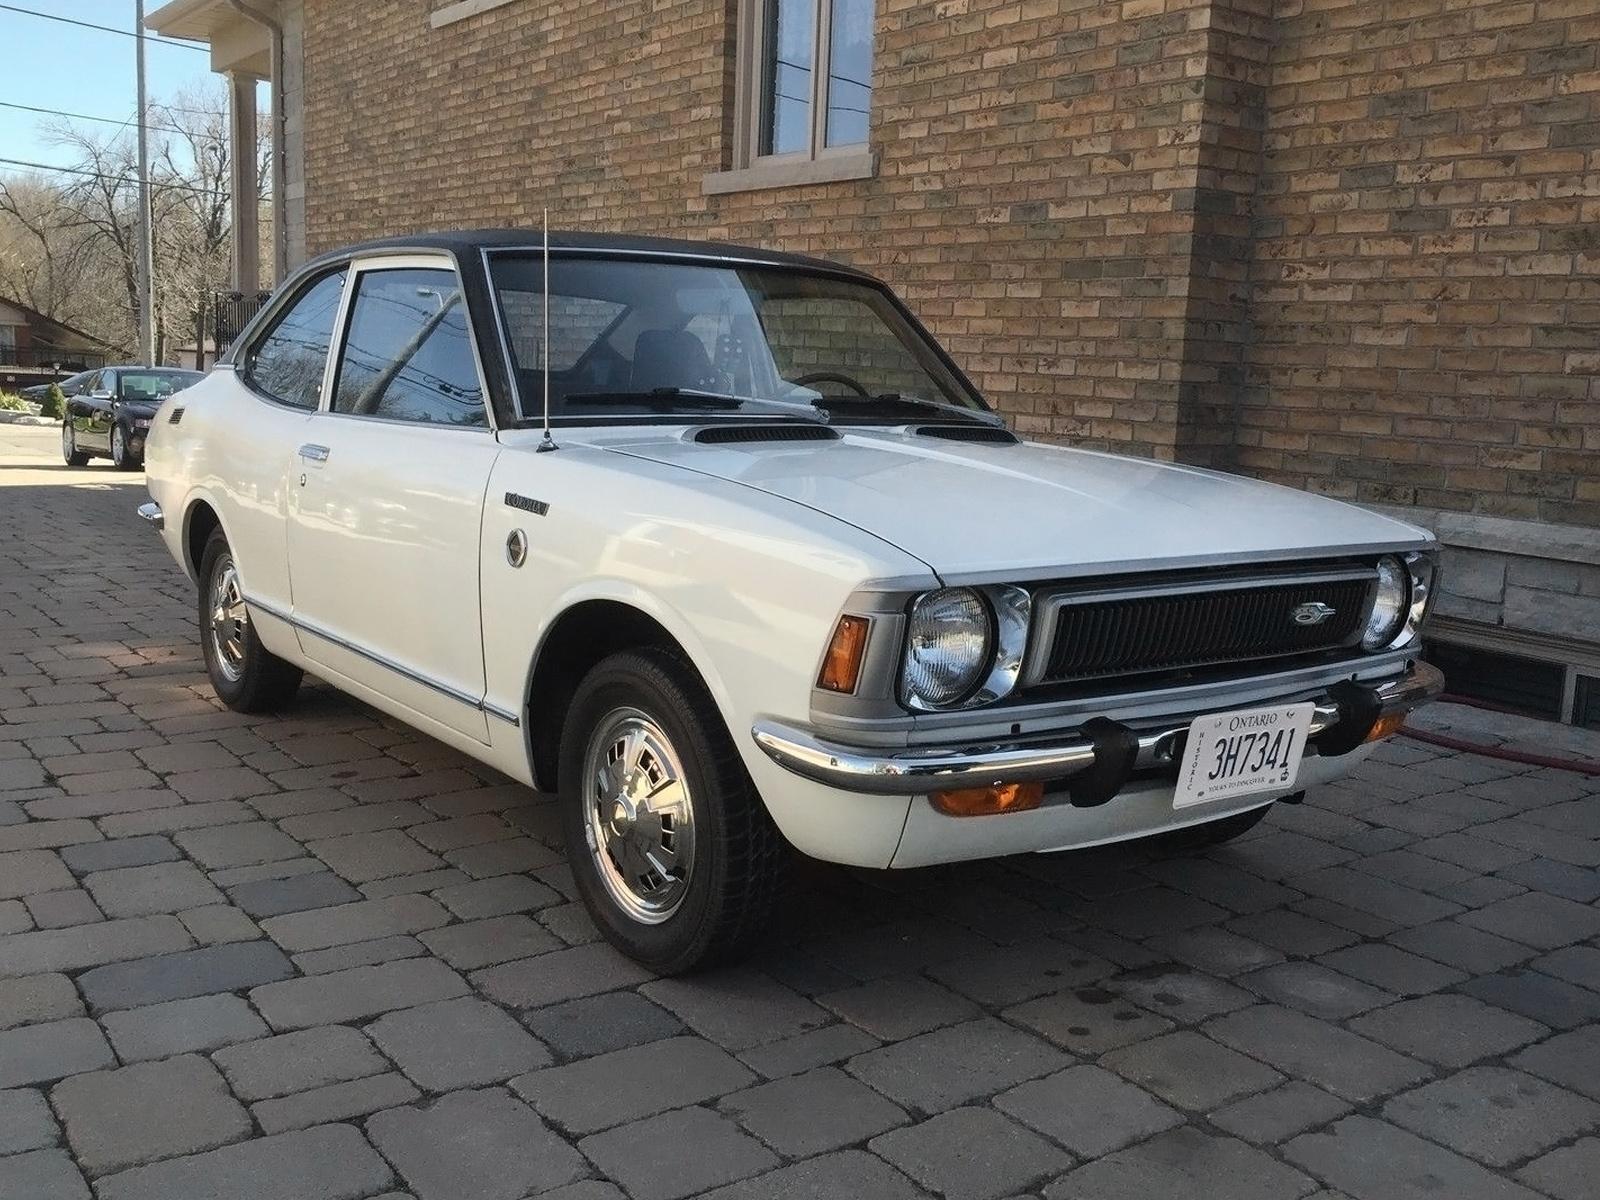 Mini Hemi 1972 Toyota Corolla Deluxe Coupe